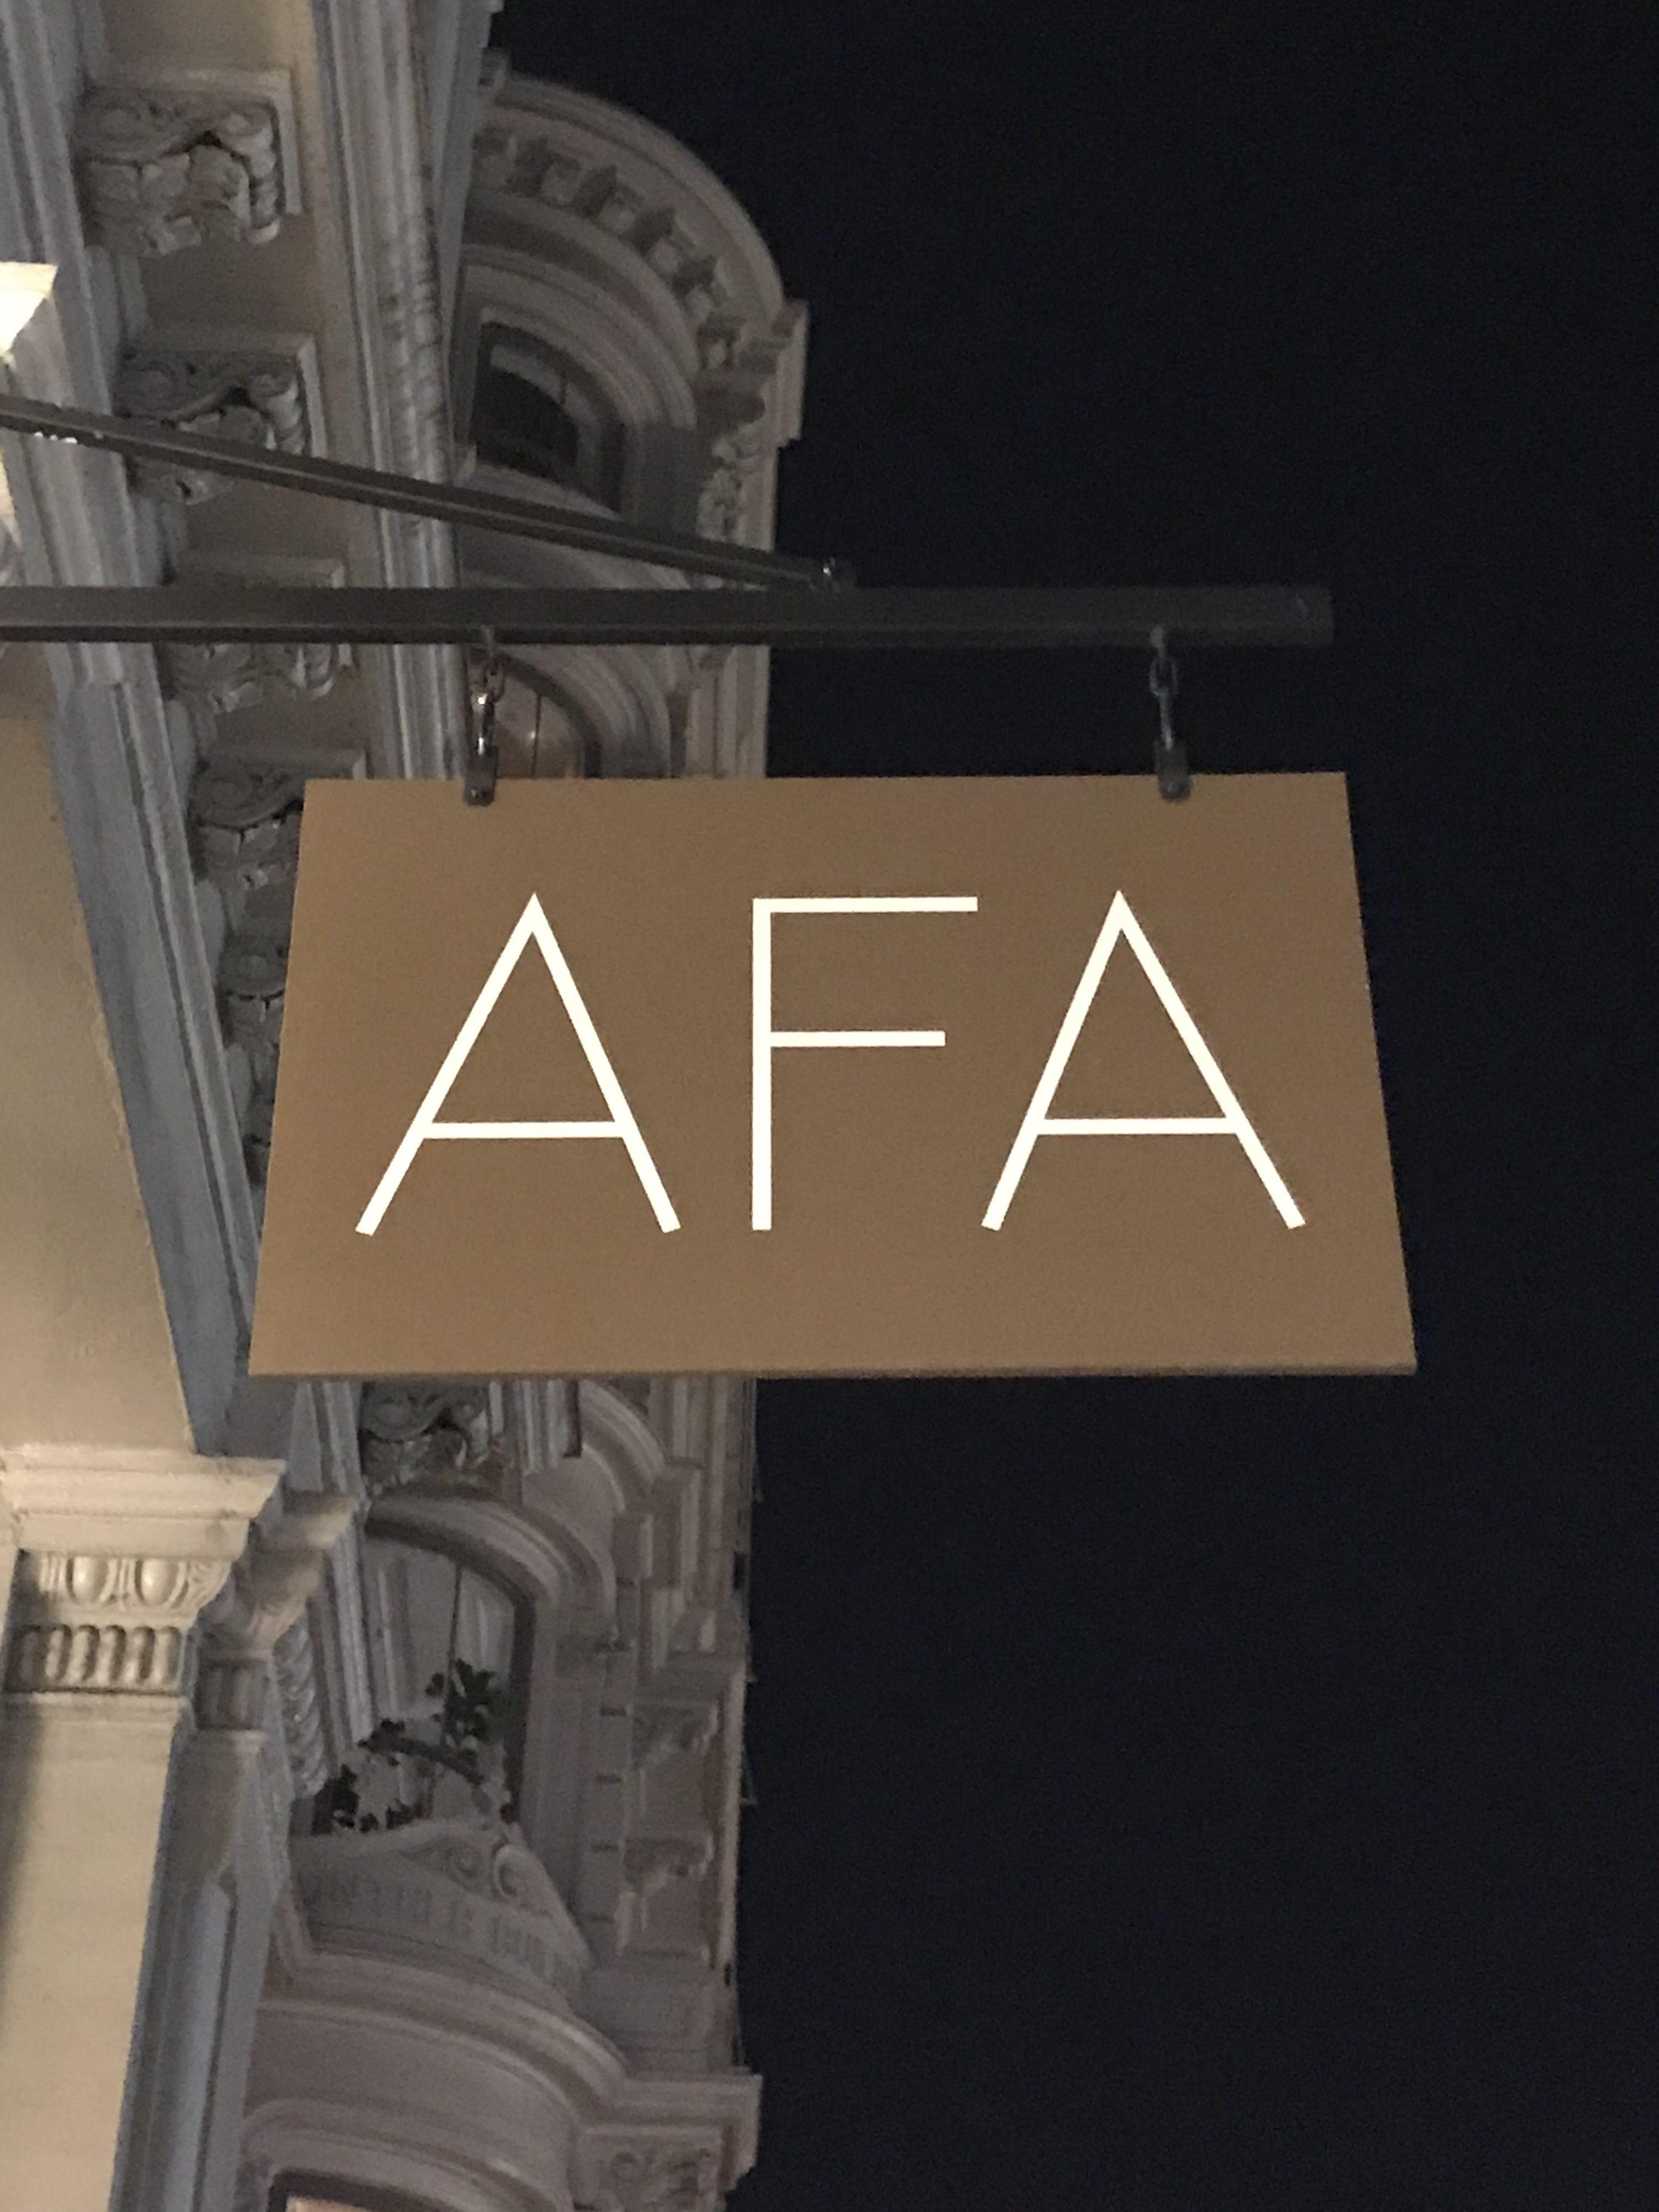 Lawyer Productivity in Alternative Fee Arrangement (AFA) World - Prism Legal